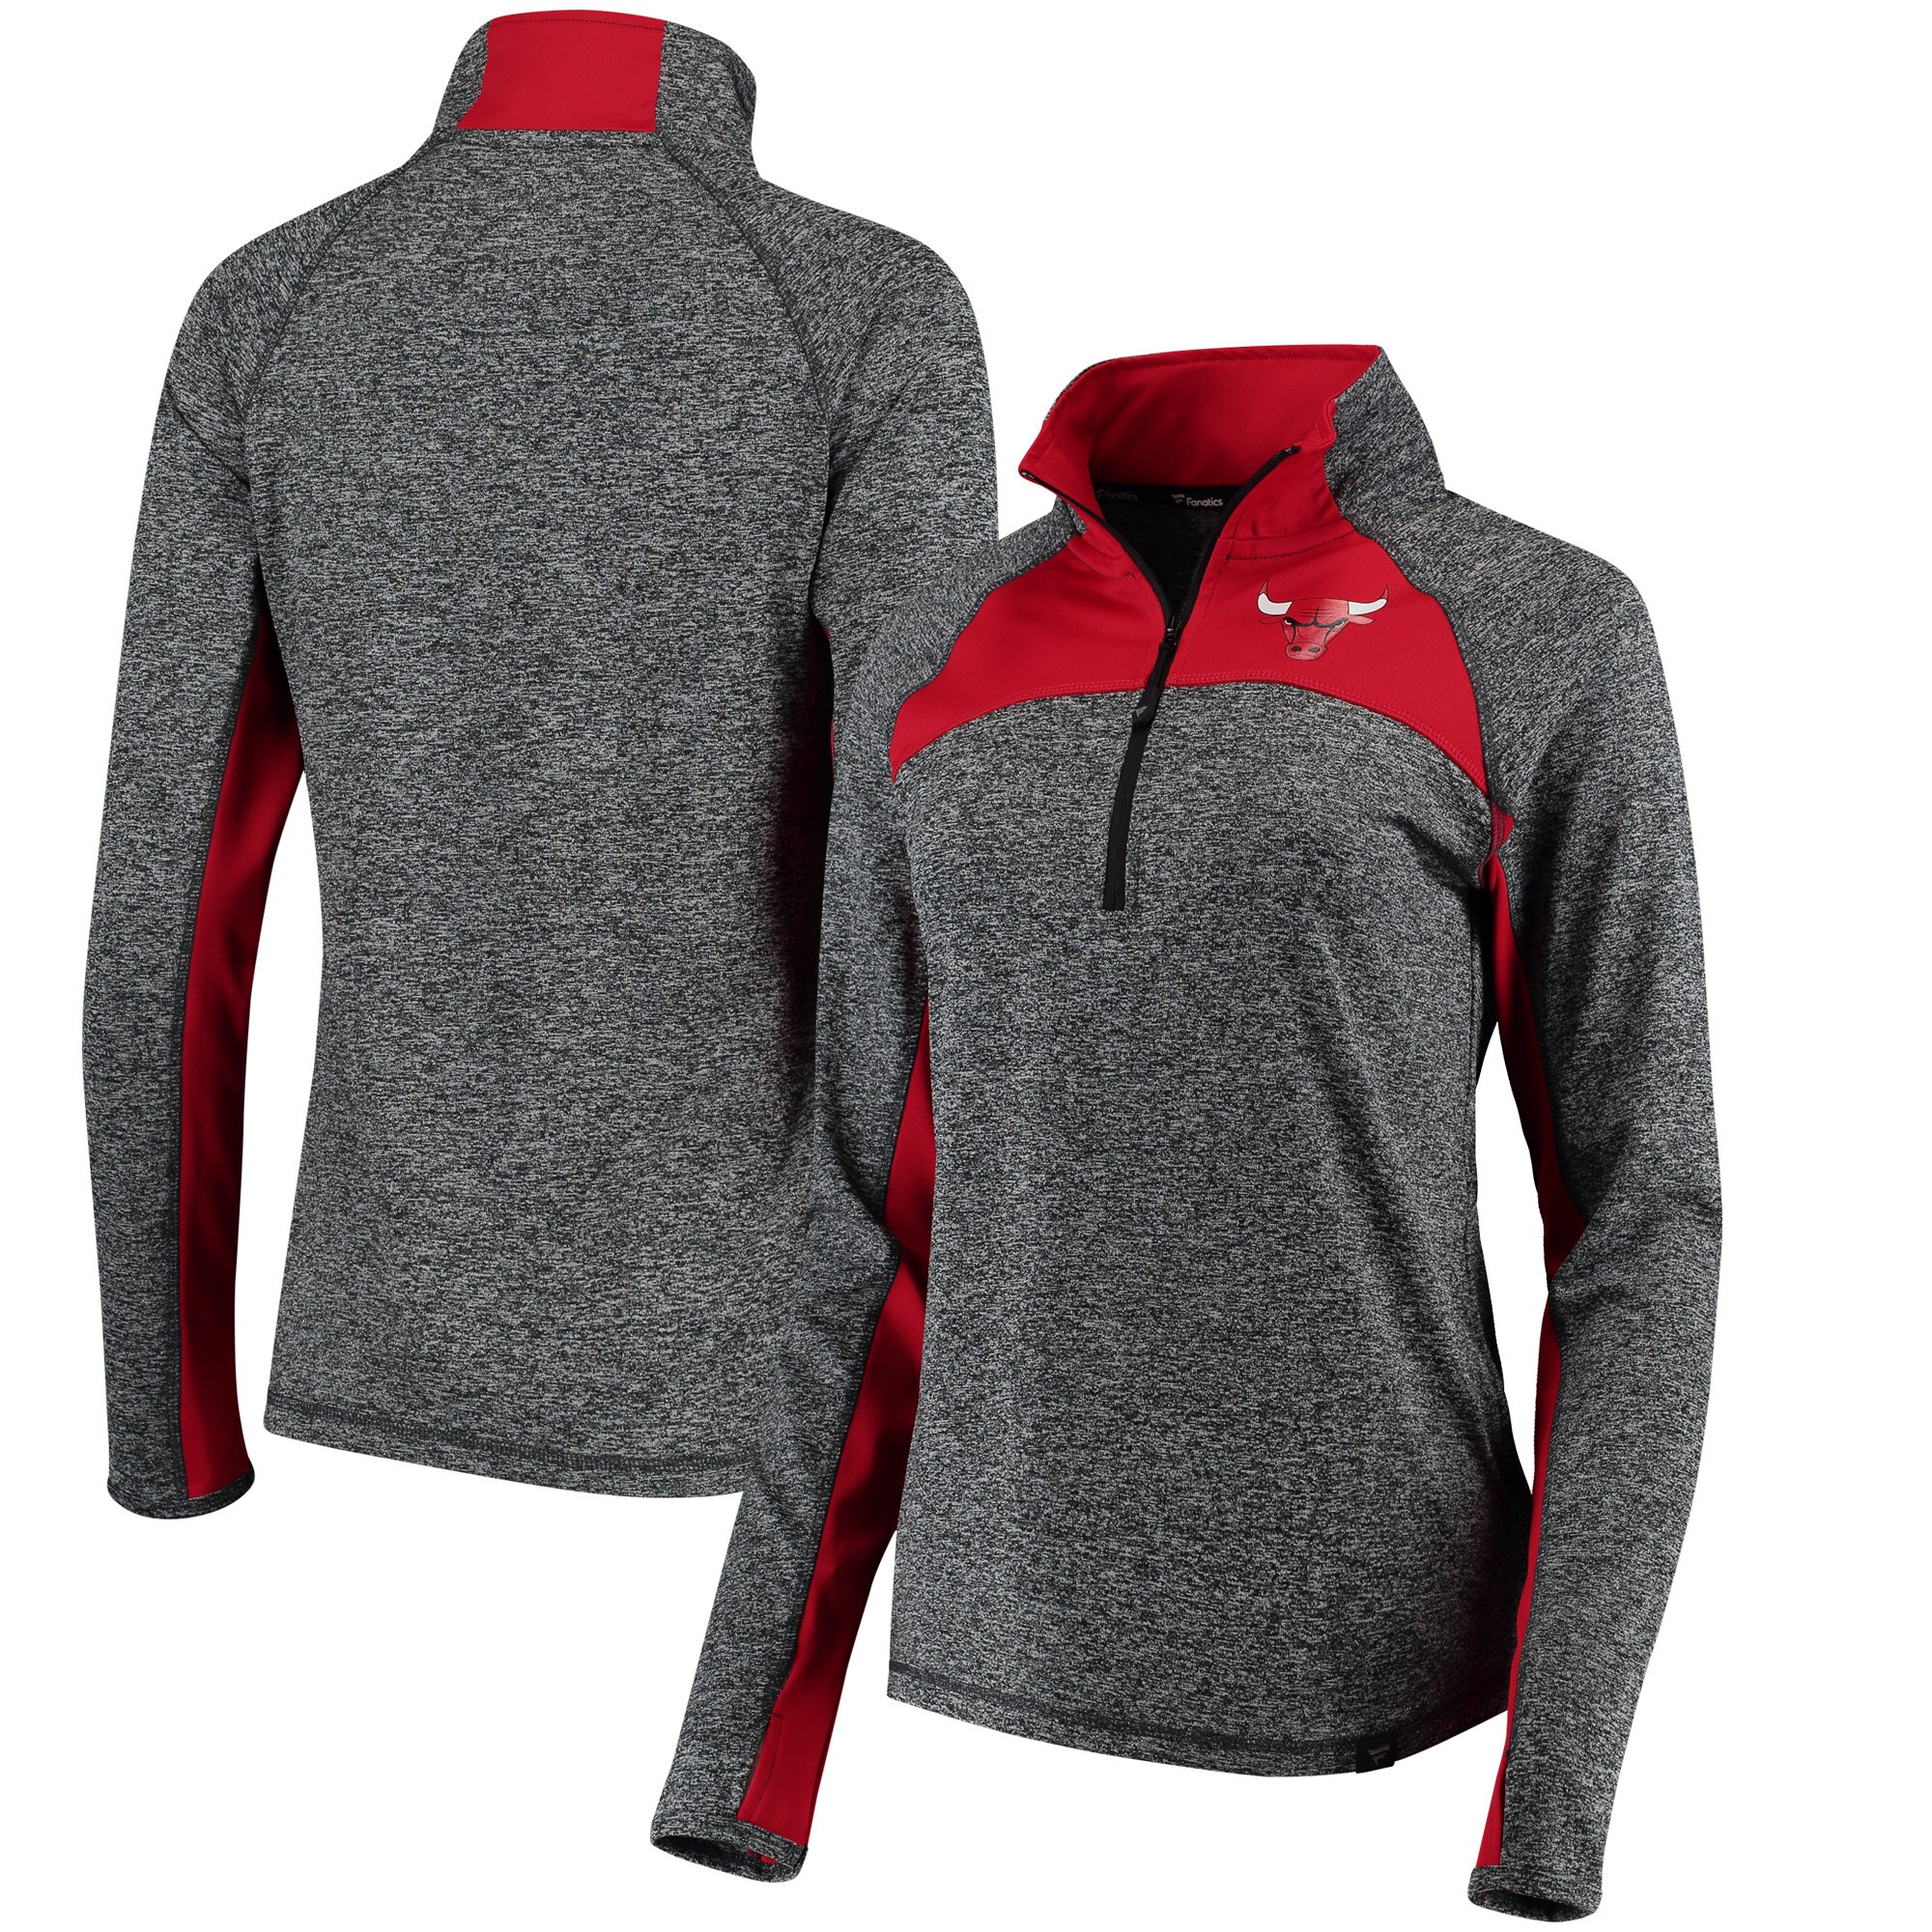 Chicago Bulls Fanatics Branded Women's Static Quarter-Zip Pullover Jacket - Heathered Gray